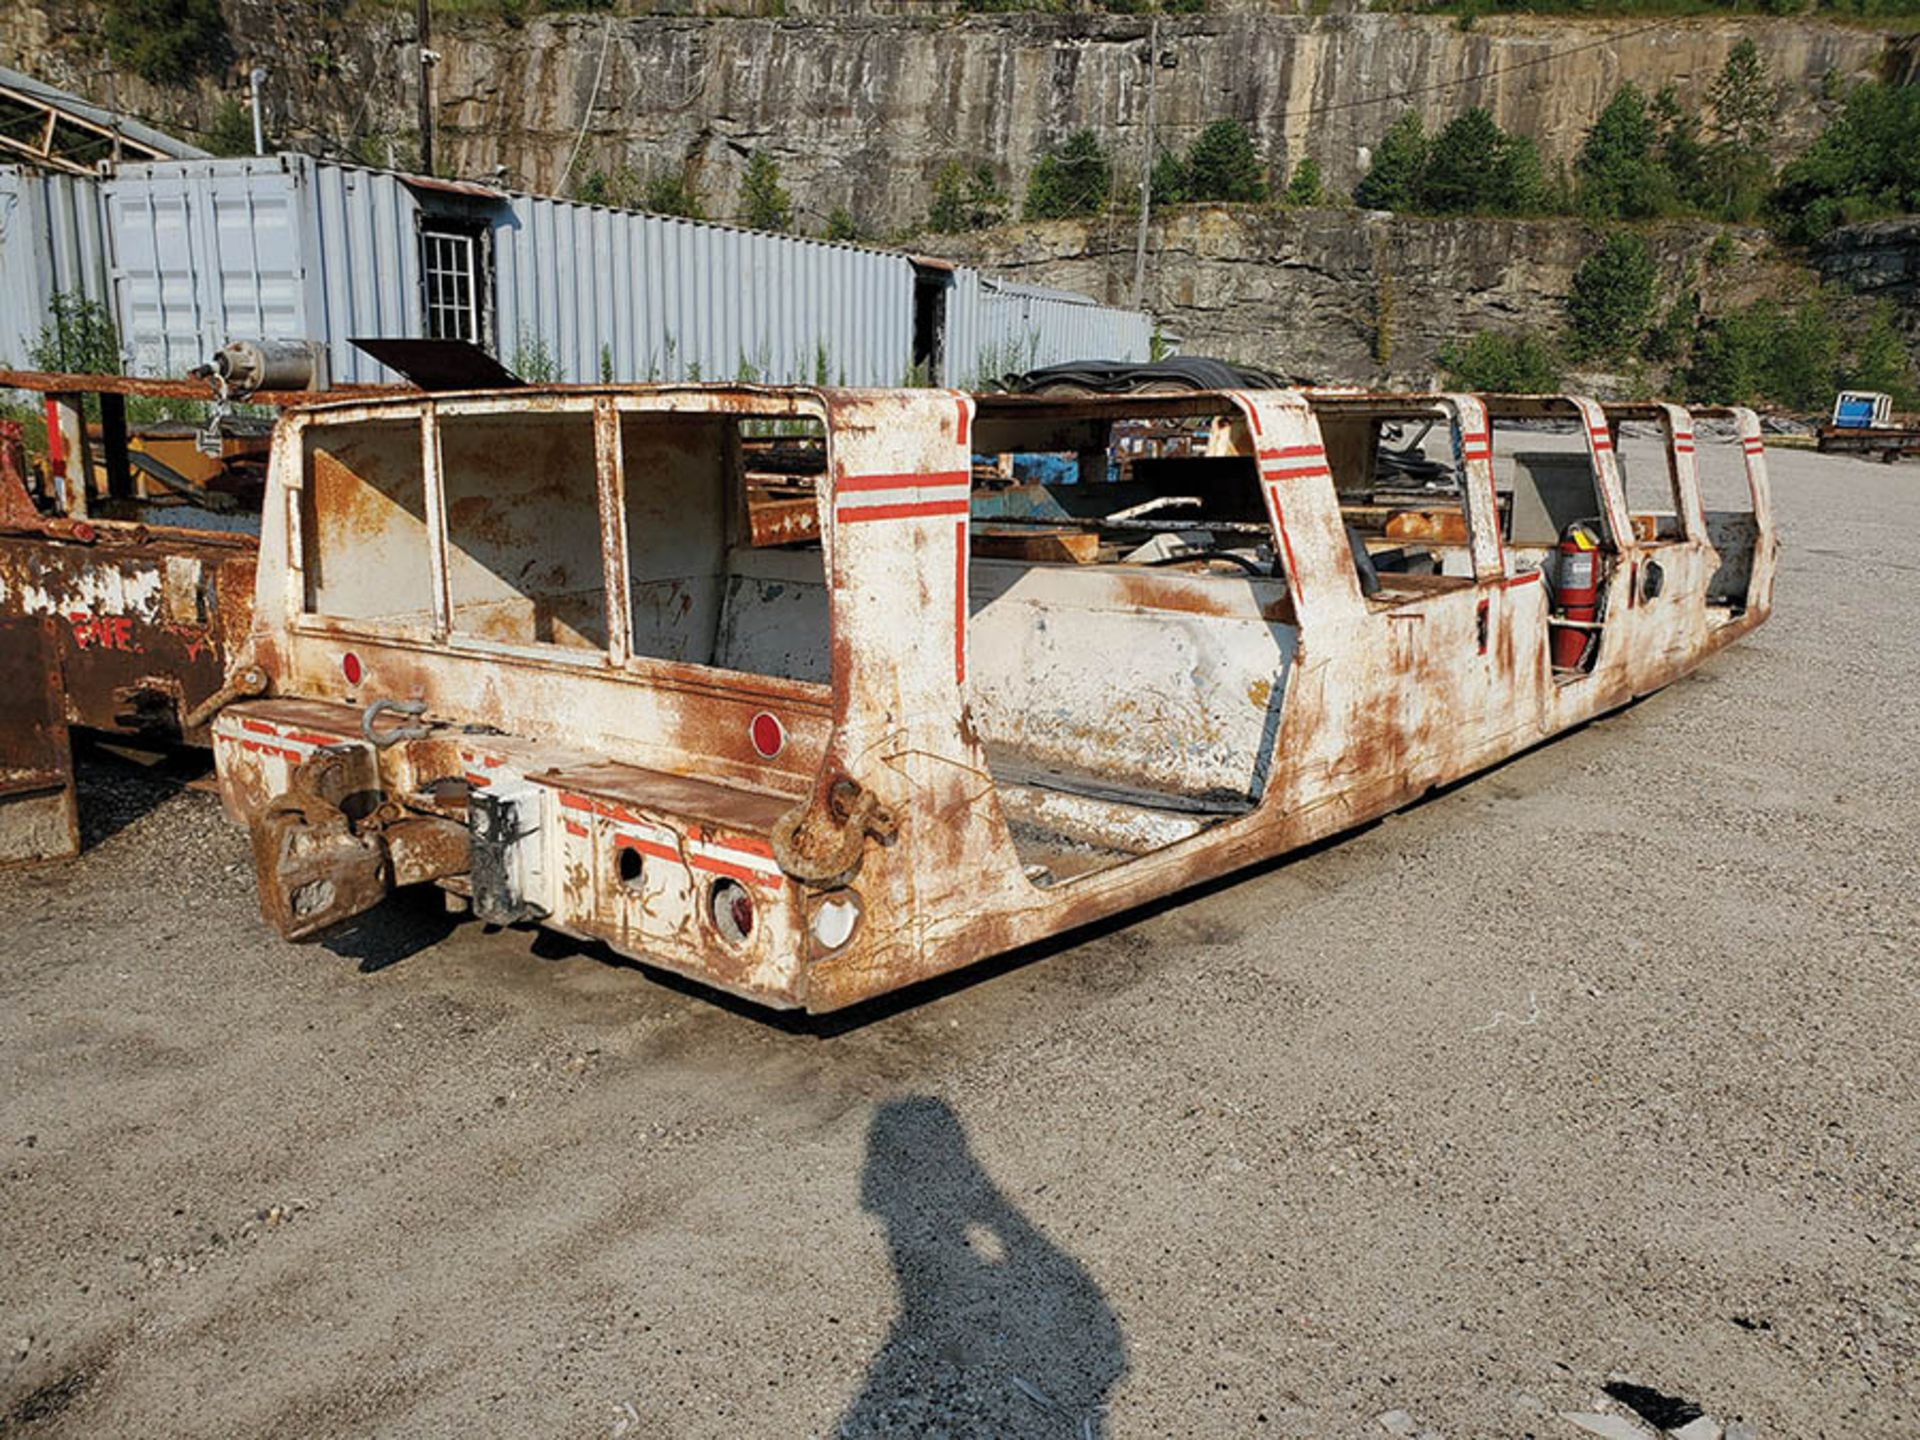 Lot 348 - WEST VIRGINIA MINING EQUIPMENT MAN BUS, S/N 700-0810, LOCATION: MATRIC DEEP MINE